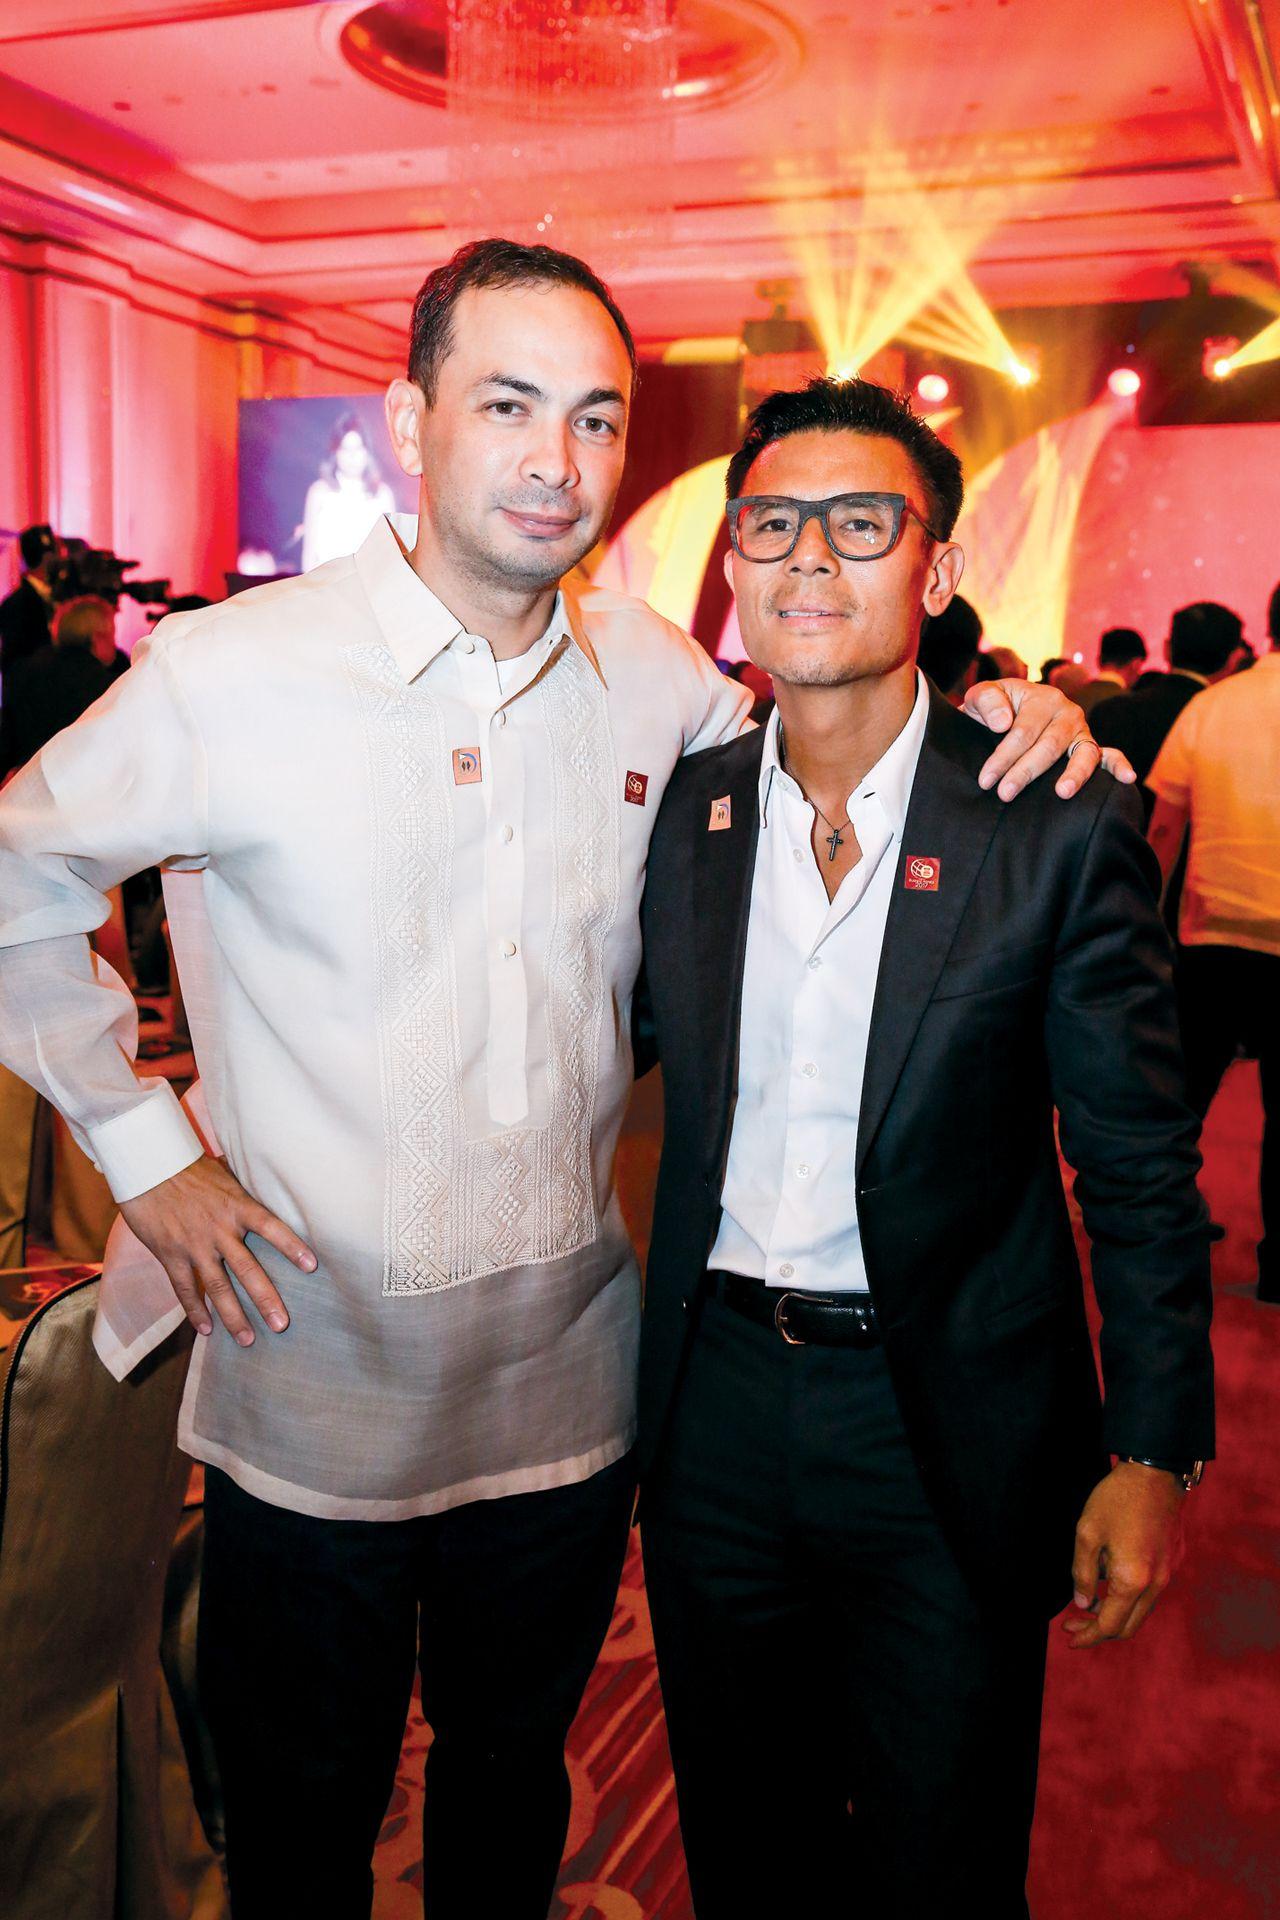 Ricky Delgado and Donnie Tantoco